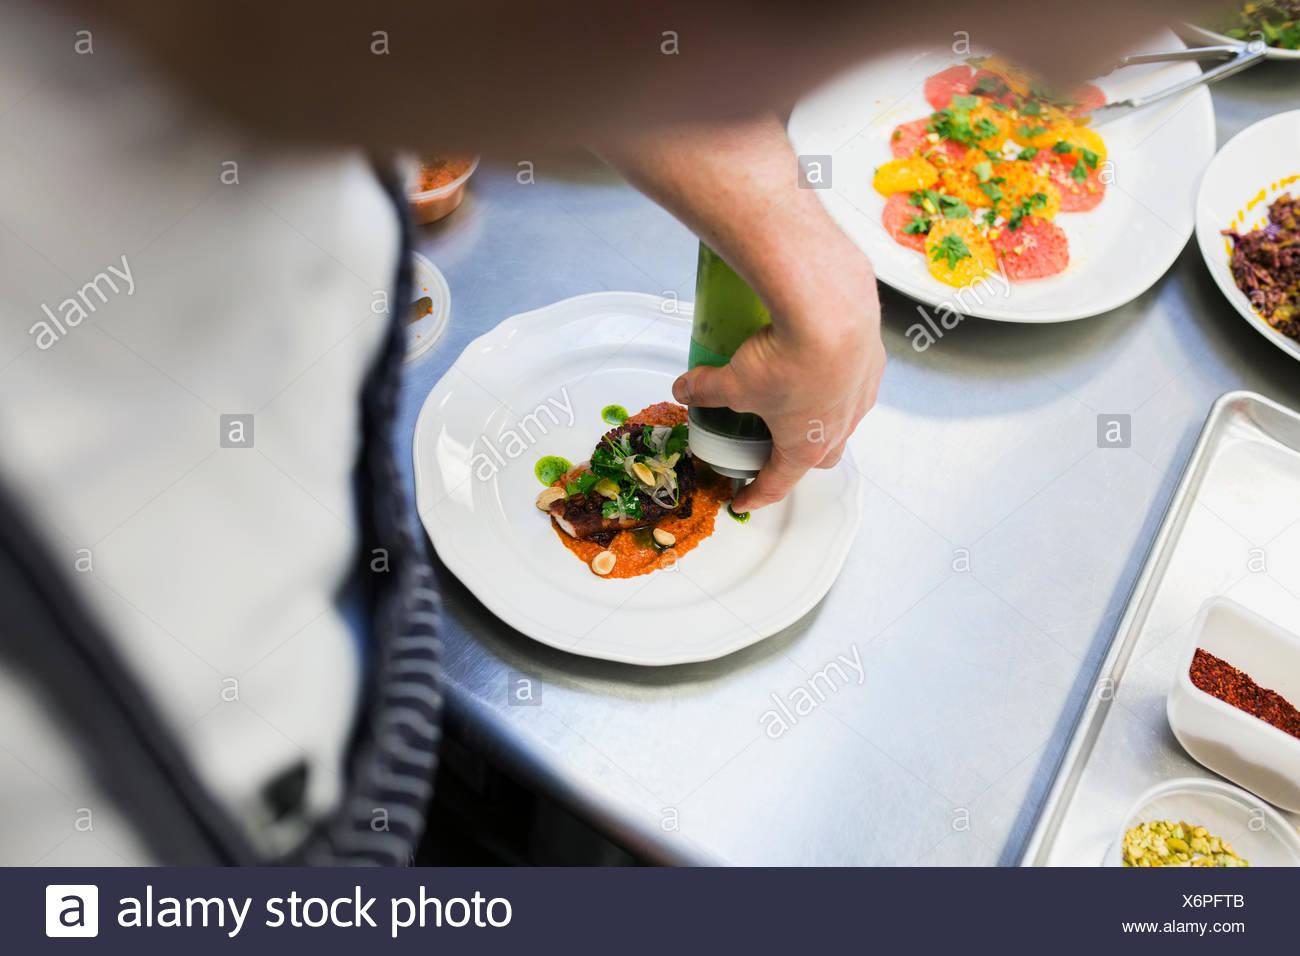 Chef chapado con salsa de alimentos en cocina comercial Imagen De Stock